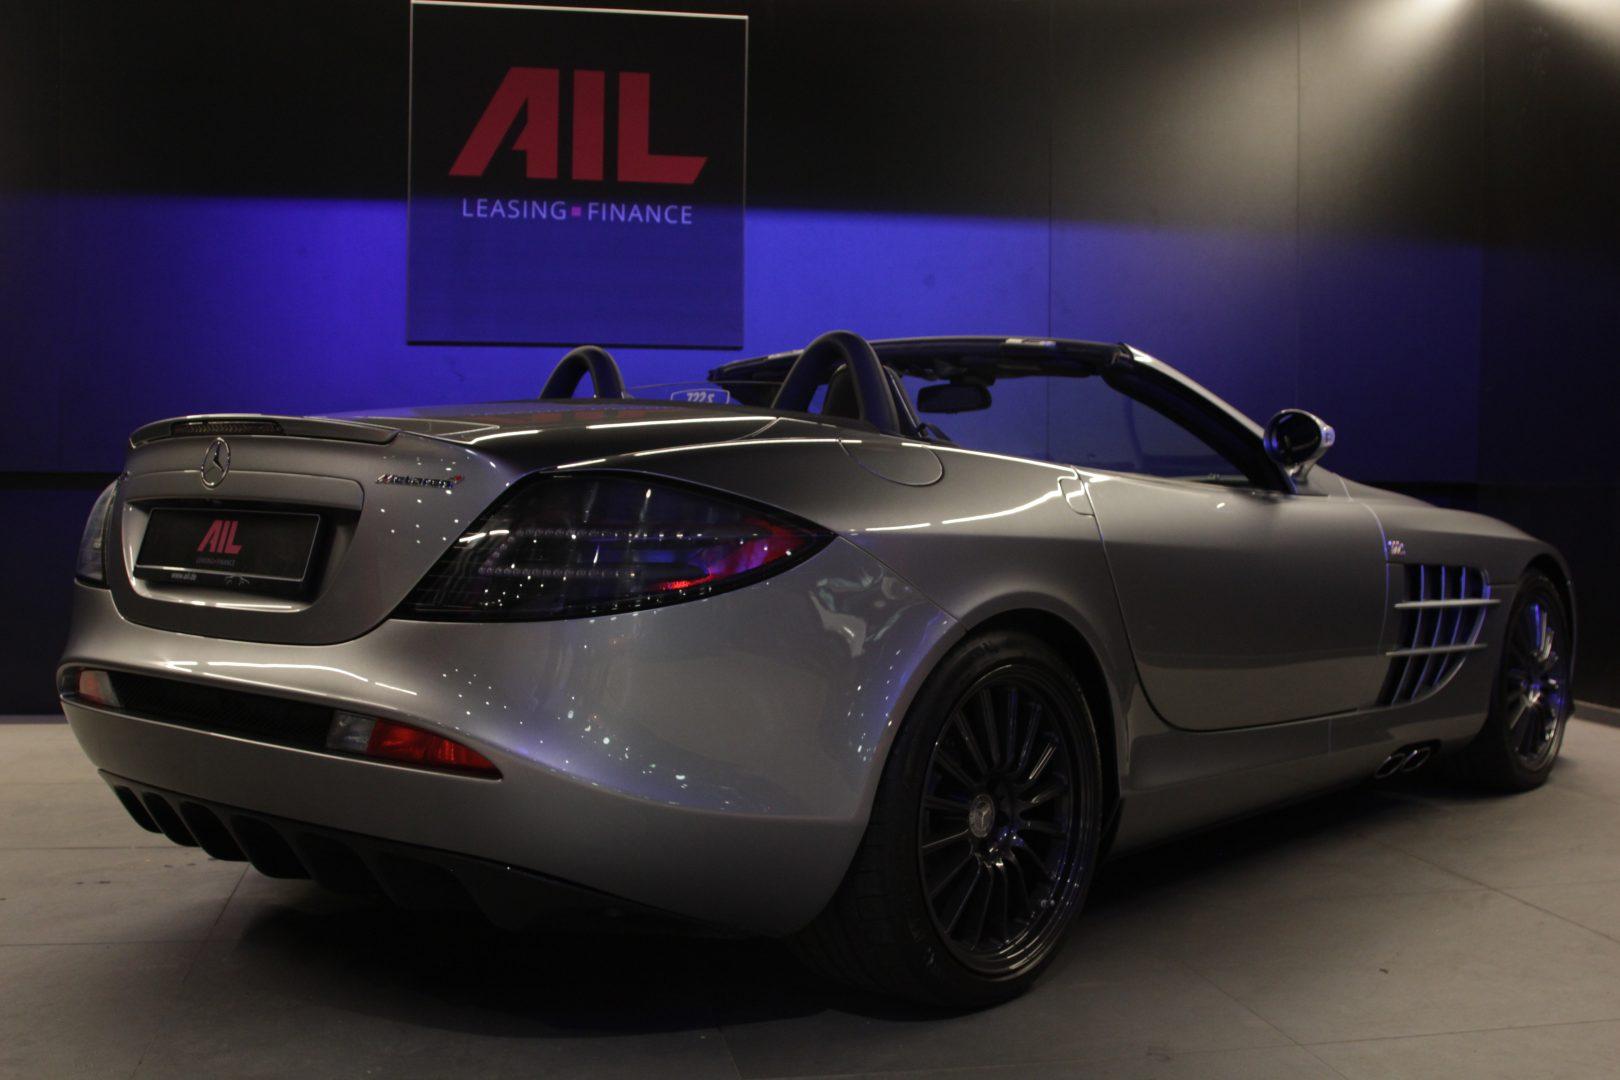 AIL Mercedes-Benz SLR McLaren Roadster 722 S 10